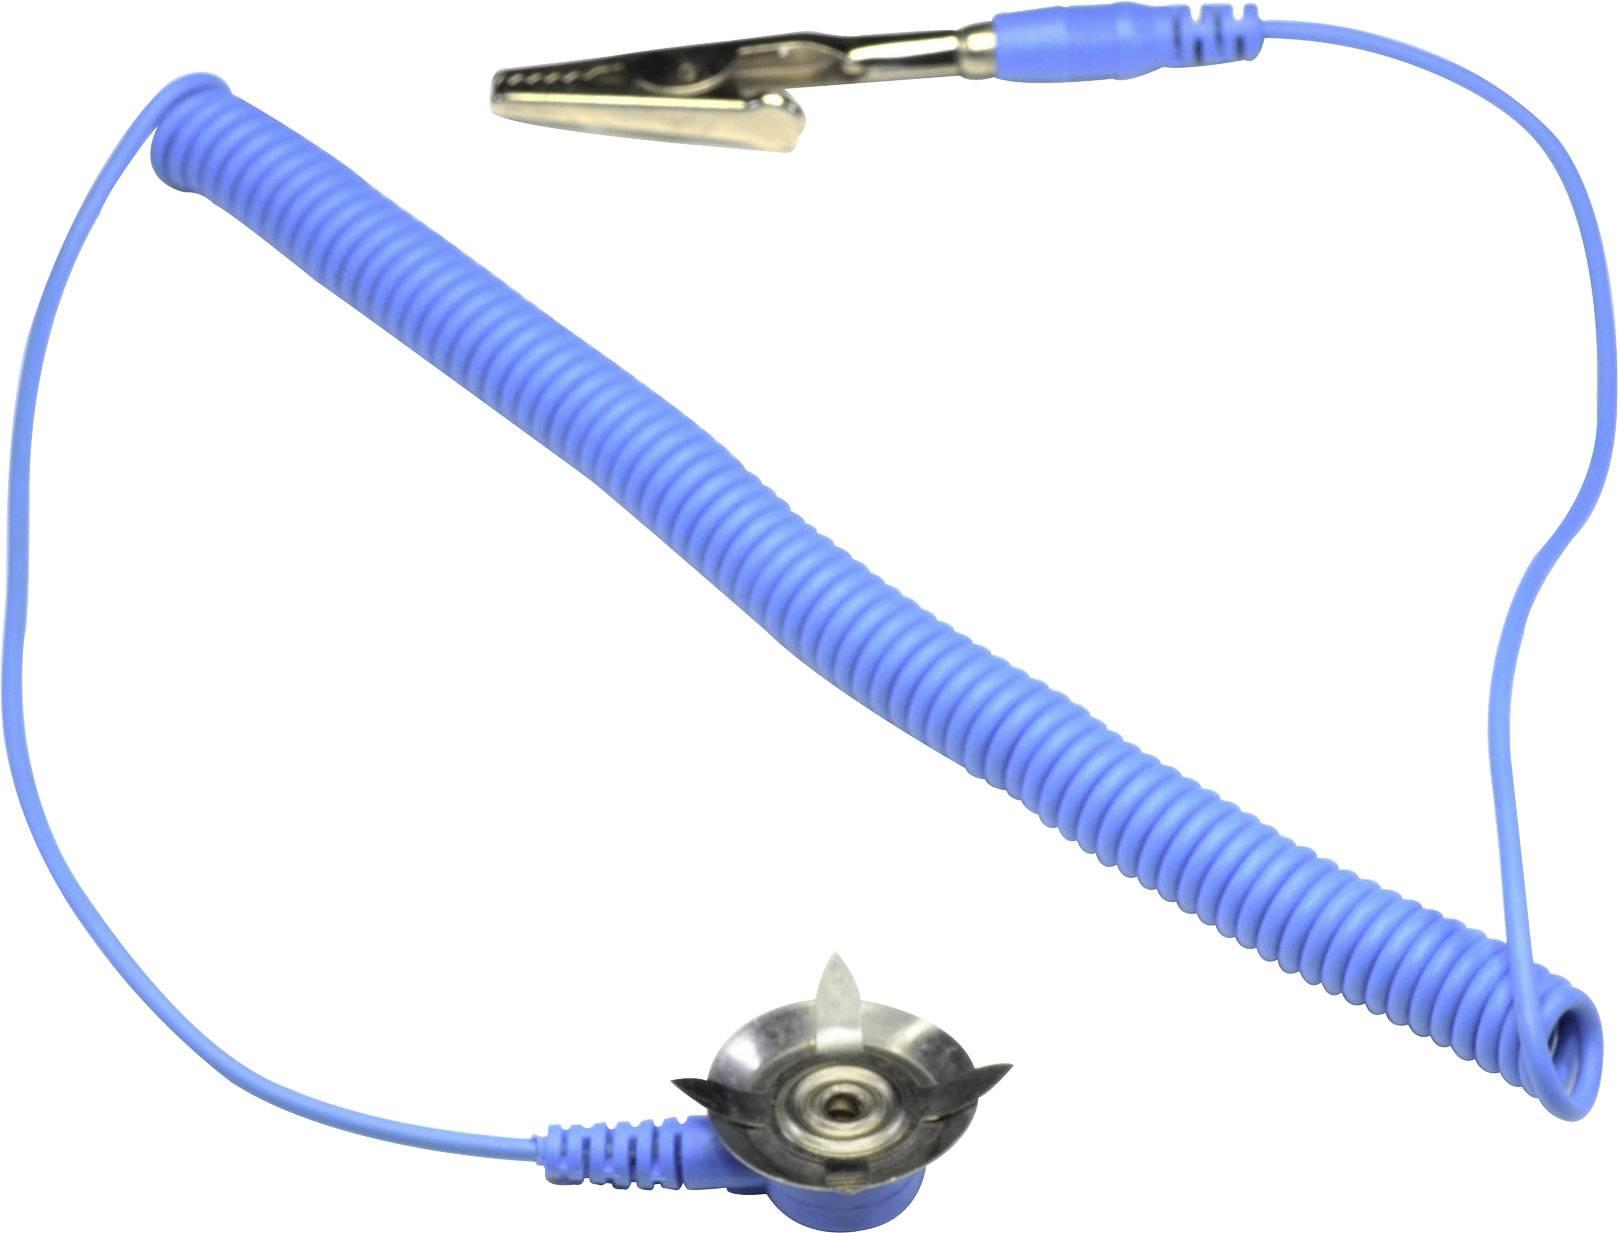 ESD uzemňovací kábel k rohožke Conrad Components EkA-305-AD-S/K, 3.05 m